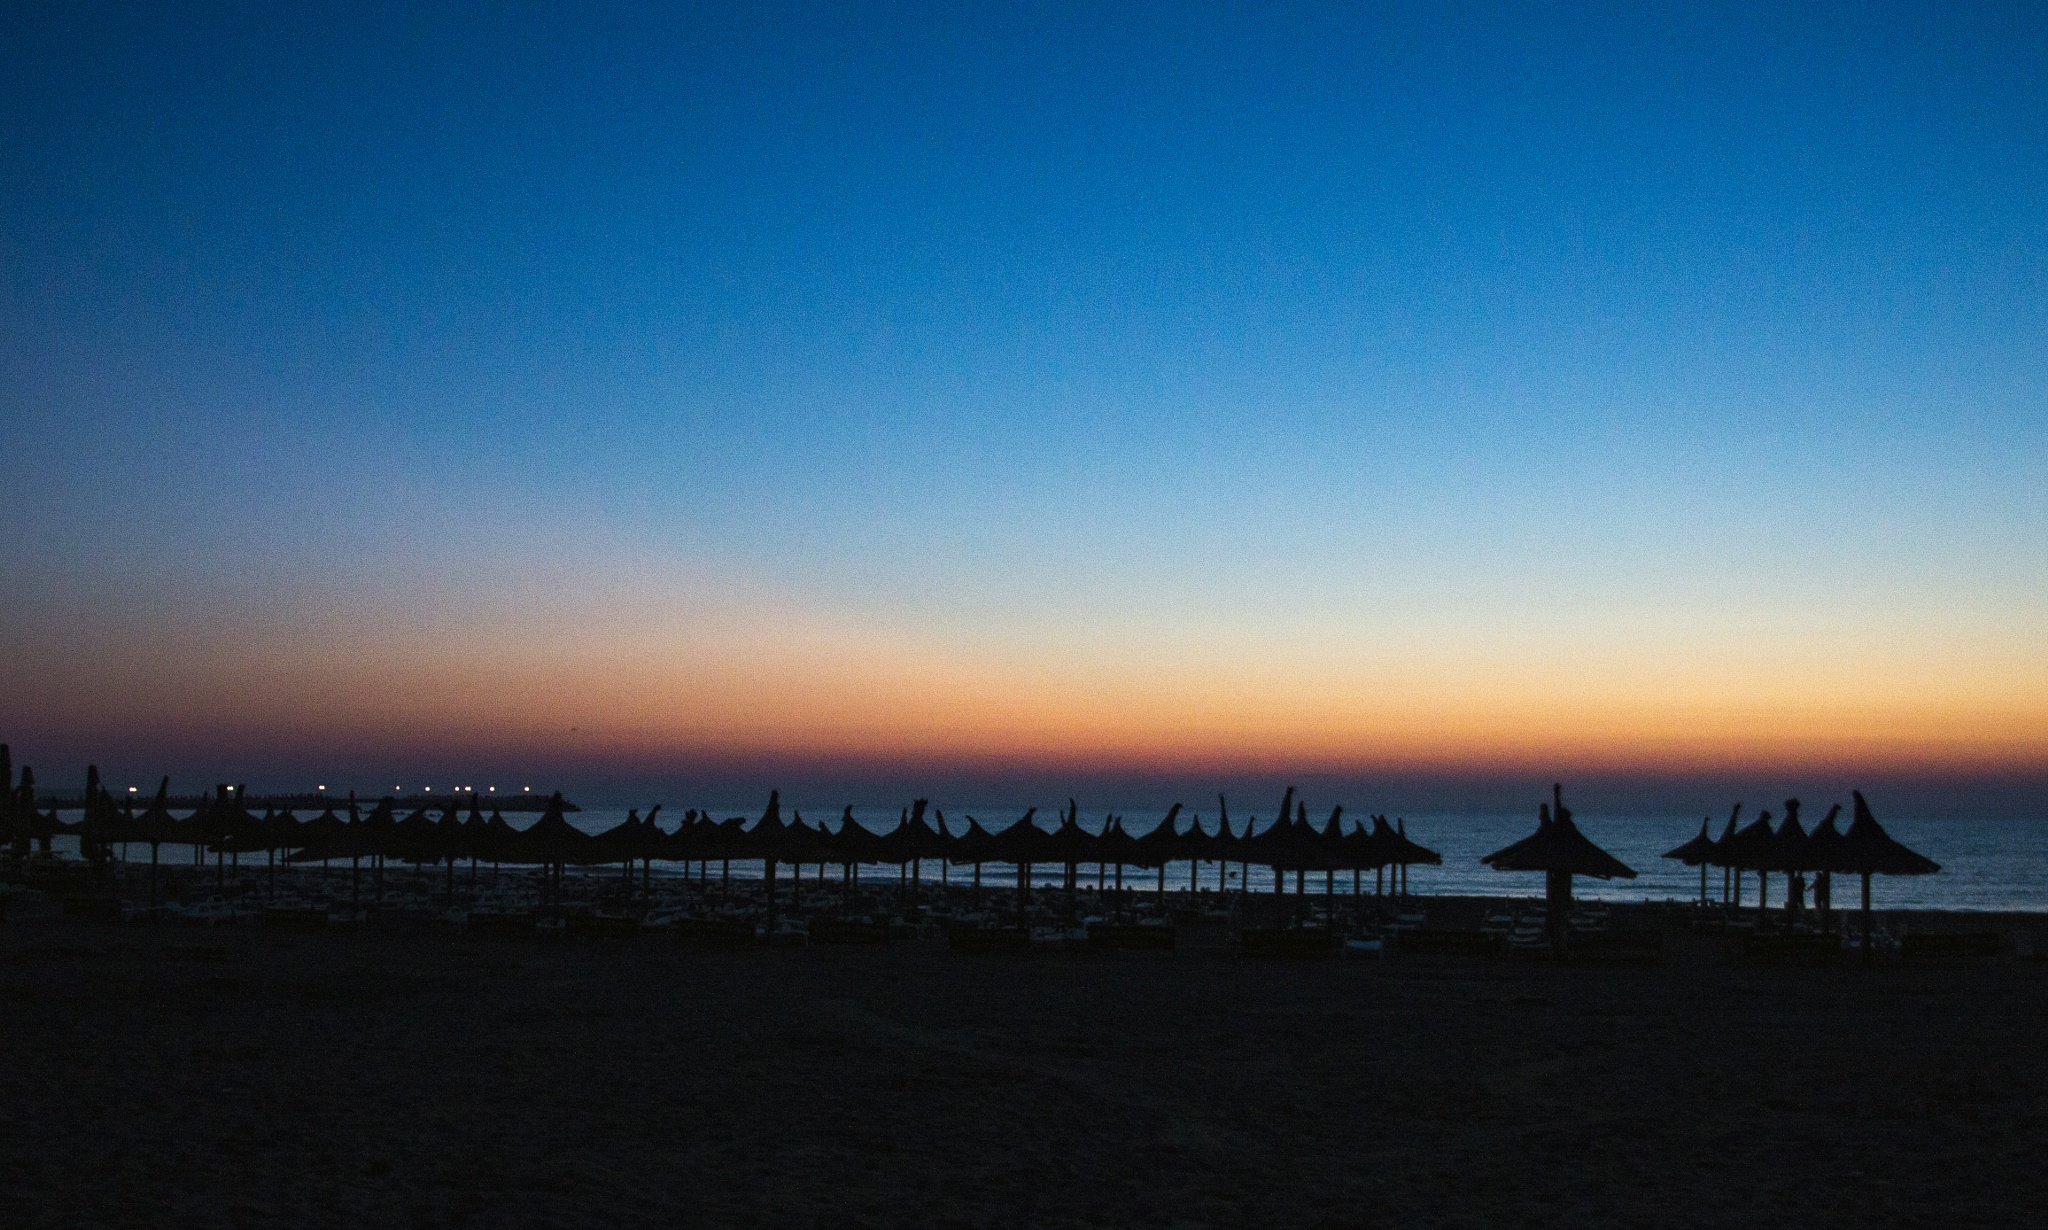 at dawn by AdrianBotescu